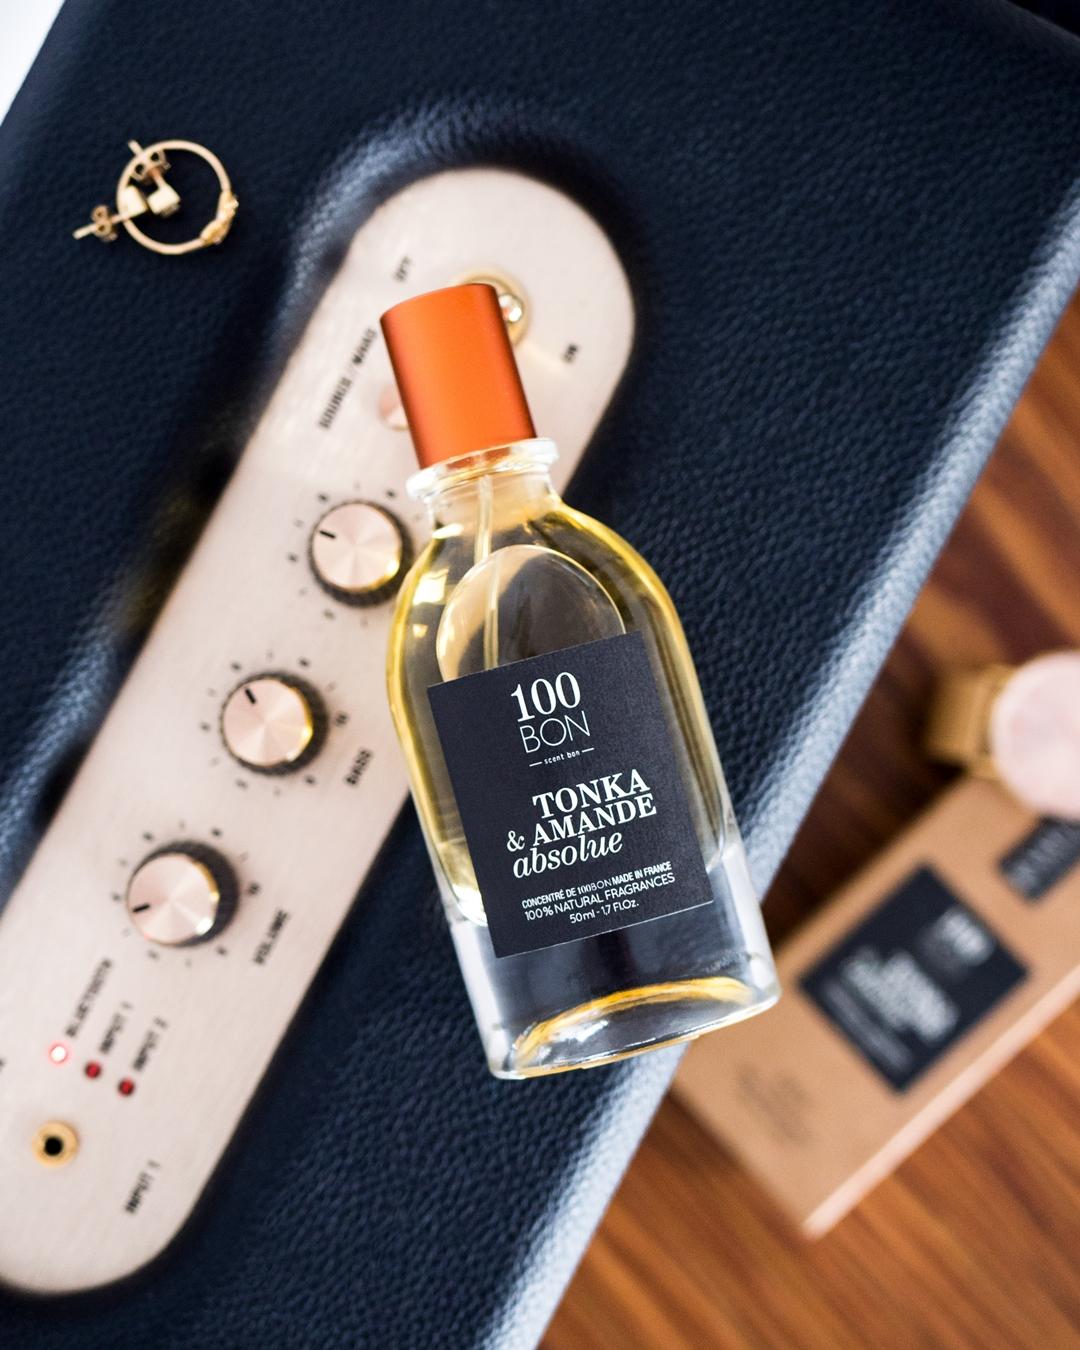 100 BON, czyli w 100% naturalne perfumy | Tonka & Amande Absolue